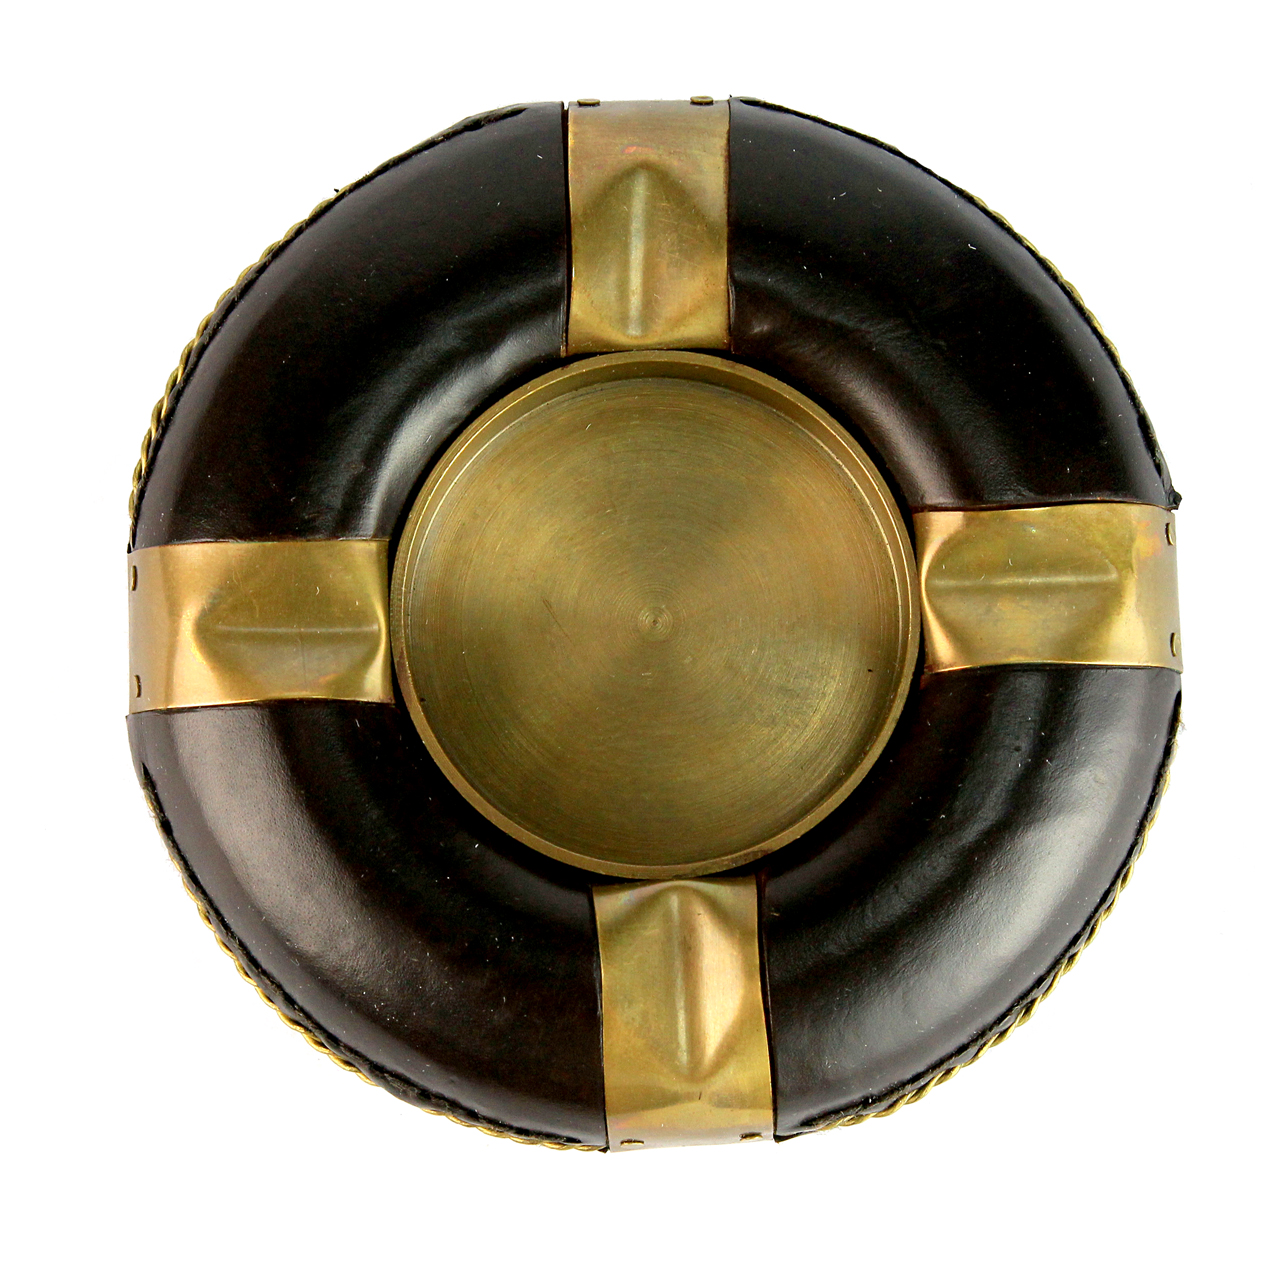 Scrumiera Rotunda Din Piele Maro Si Metal Auriu